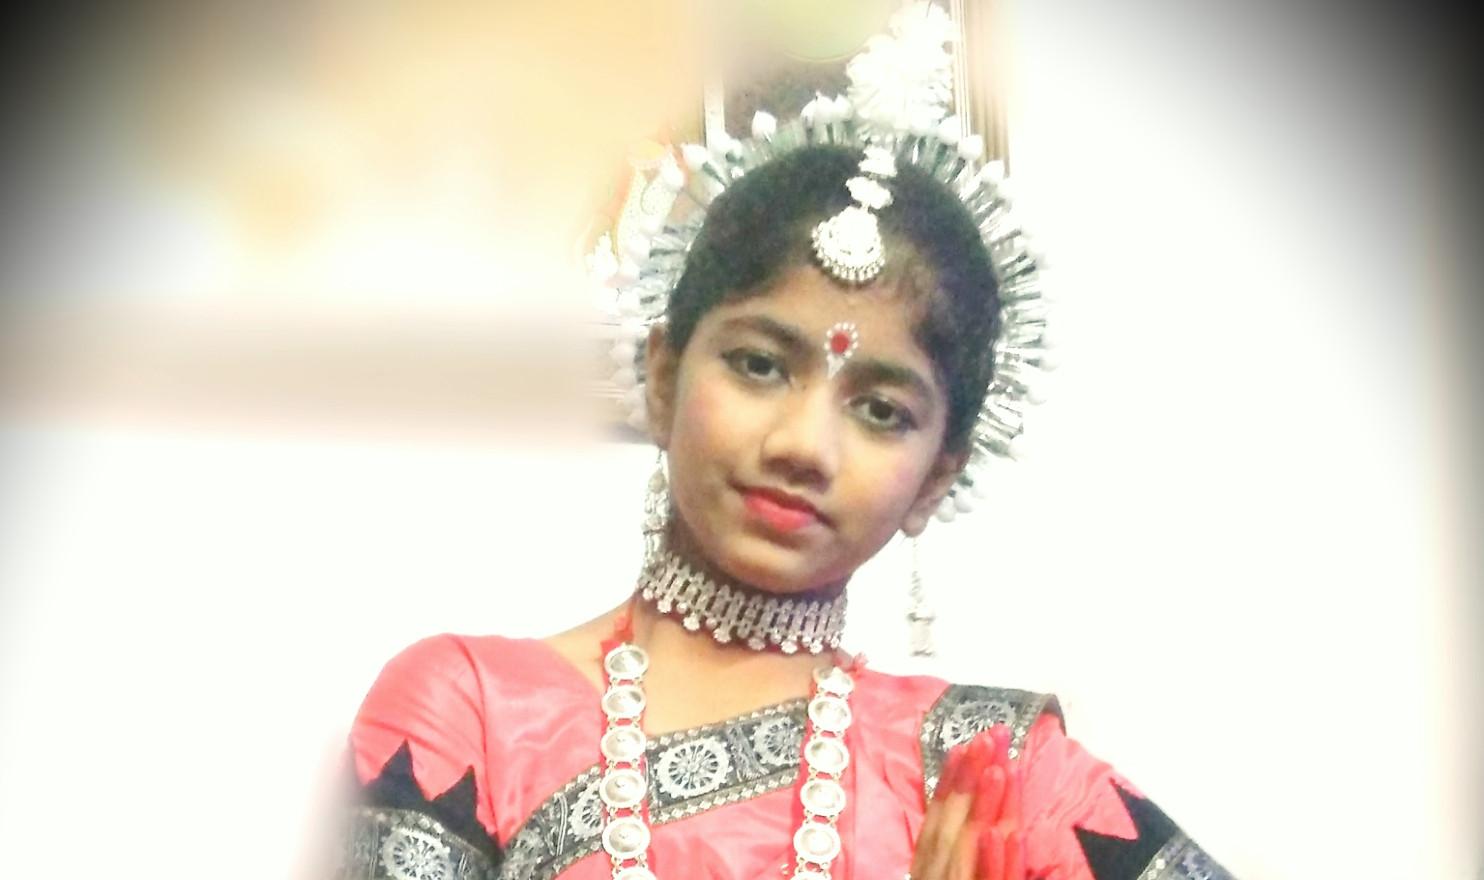 Shruti Patra